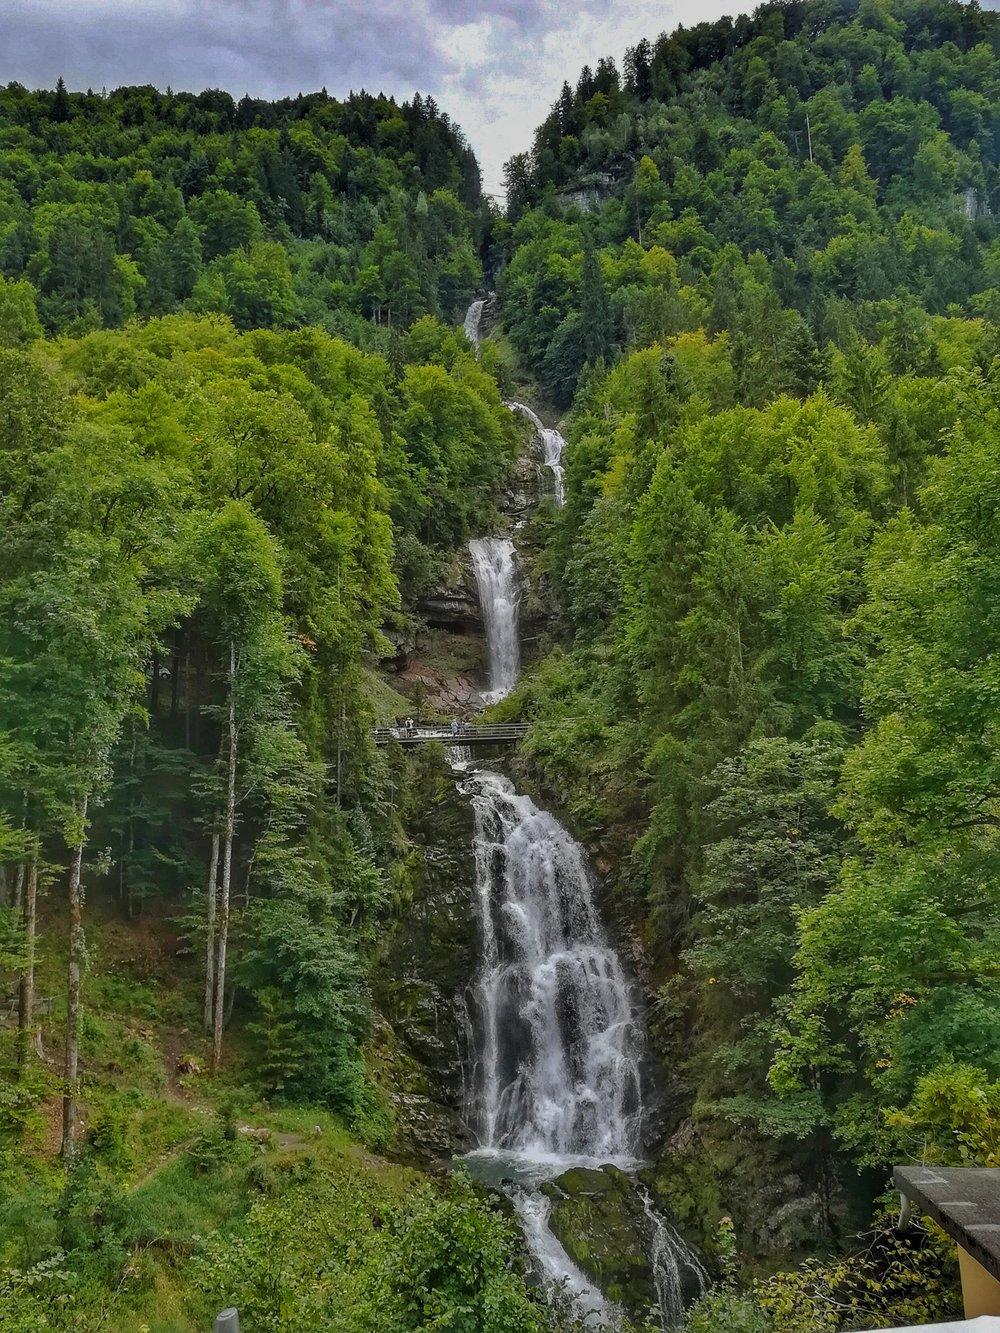 Breathtaking waterfalls everywhere